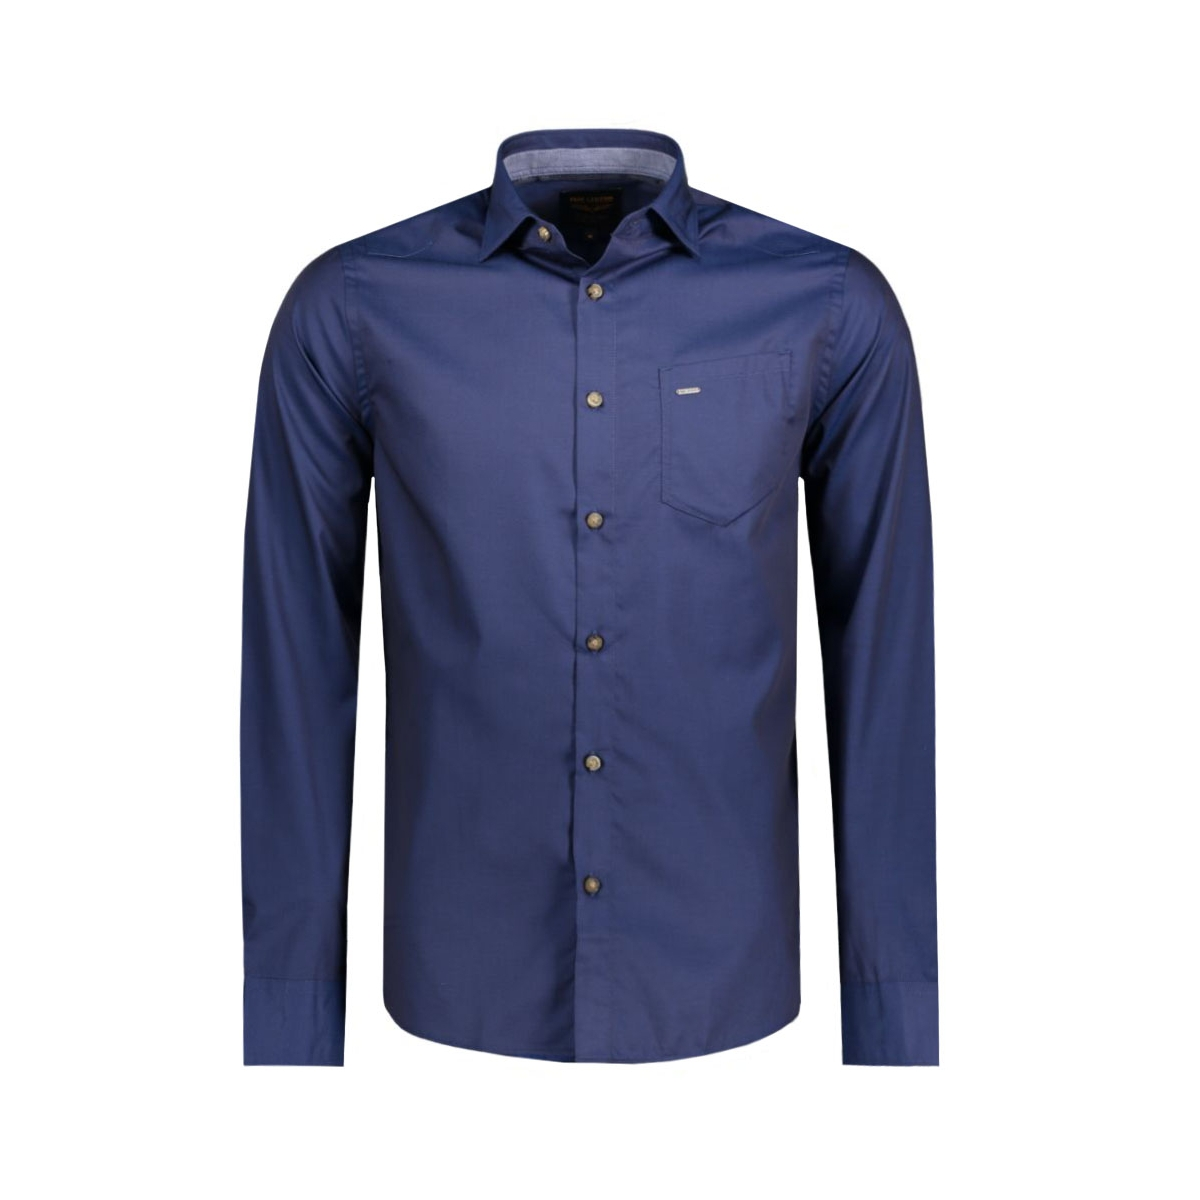 psi67290 pme legend overhemd 5903